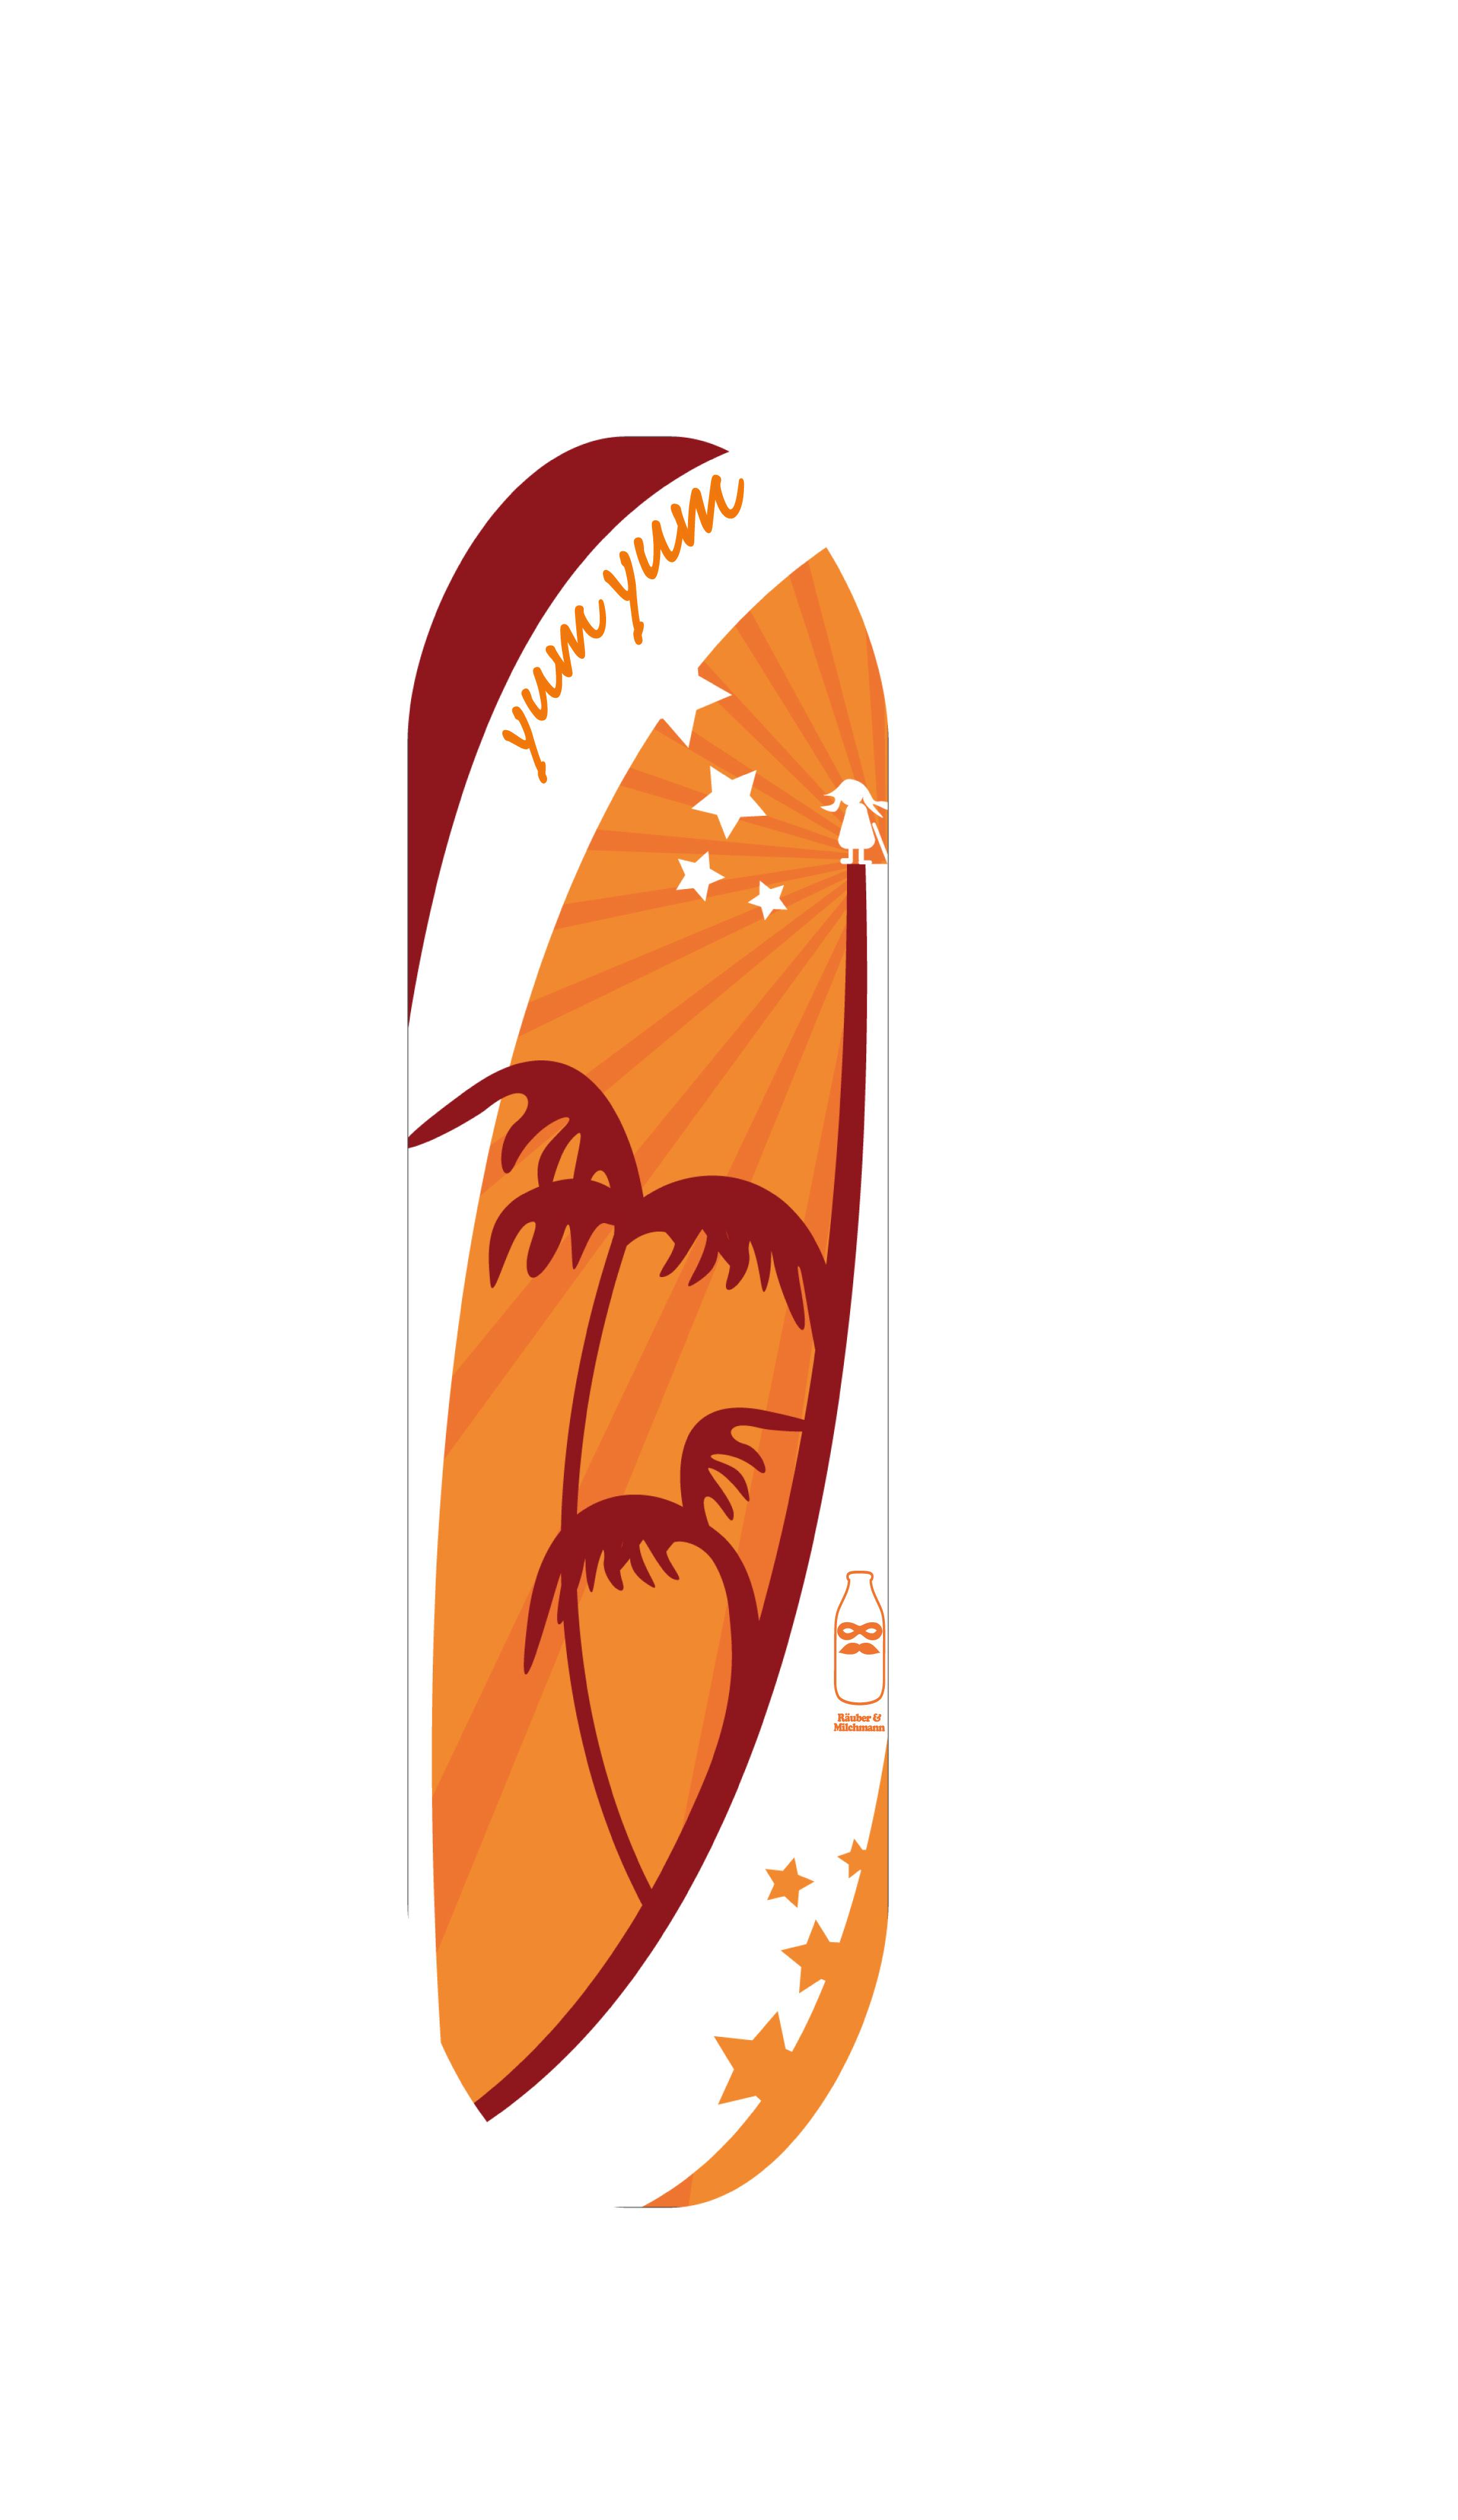 yumym skateboard Kopie.jpg